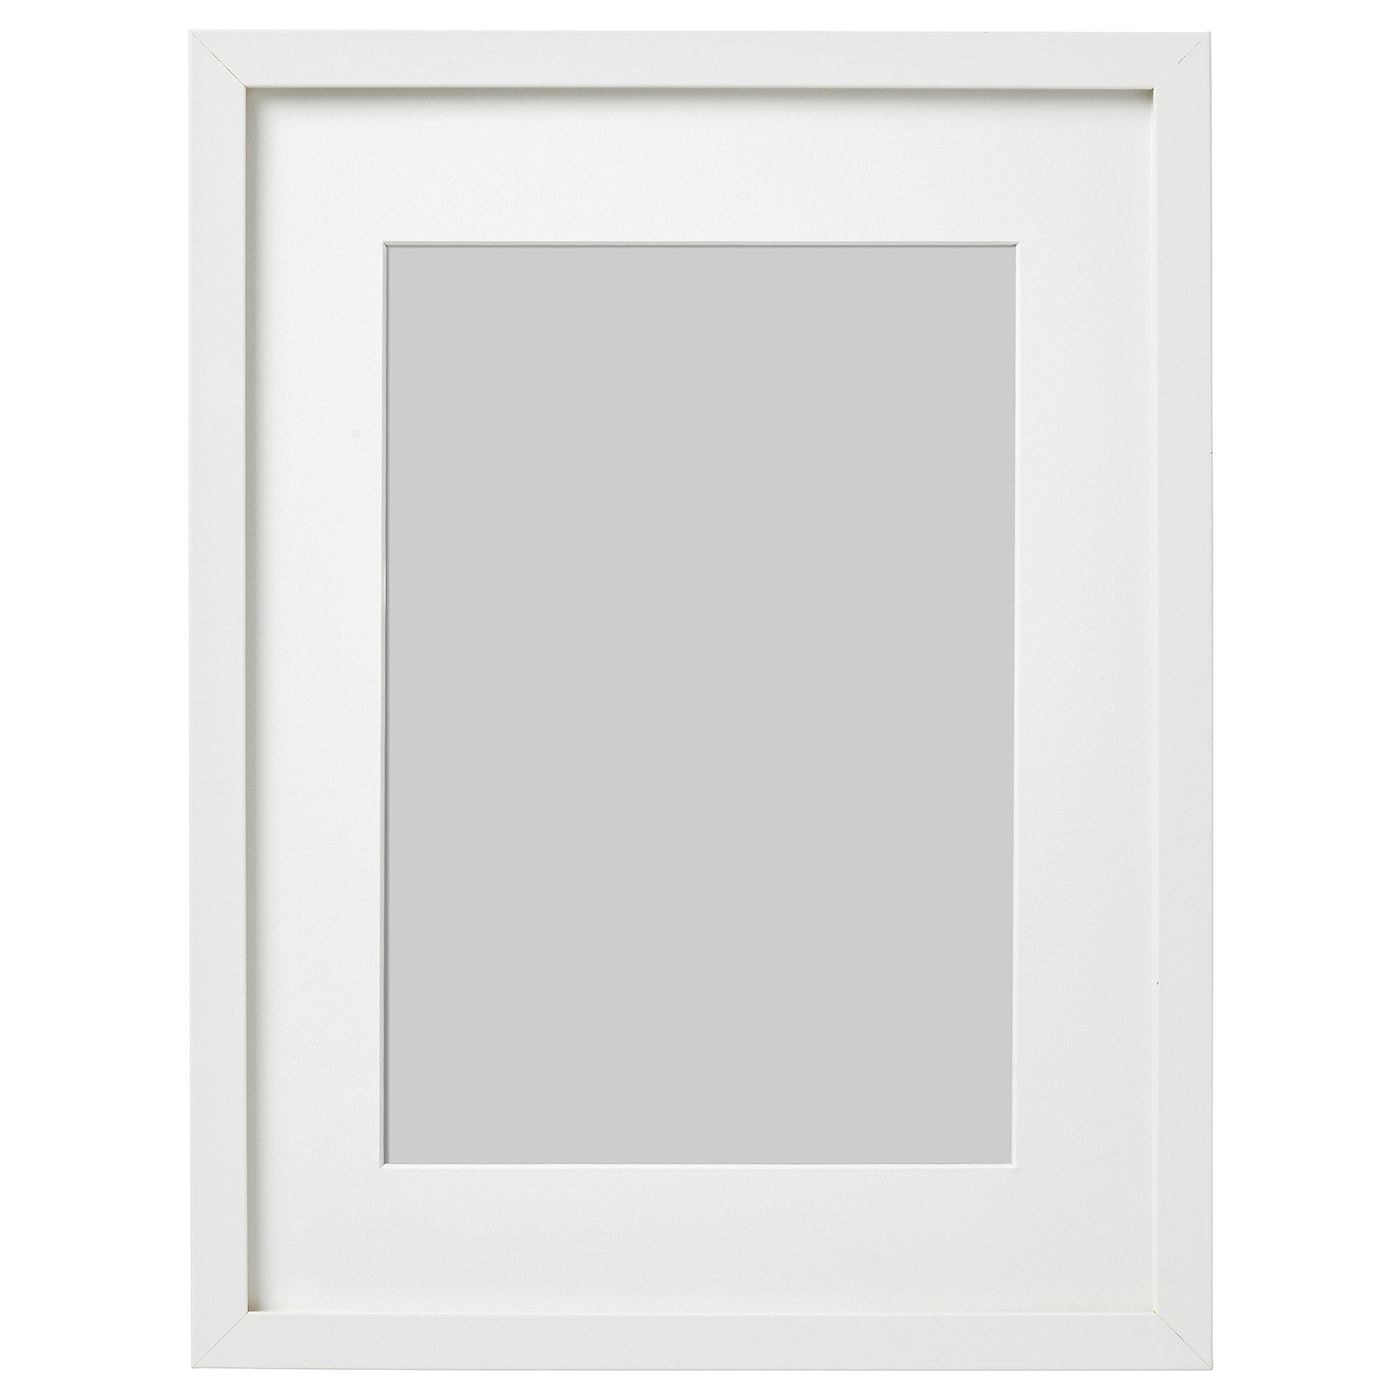 Ribba White Frame 30x40 Cm Ikea